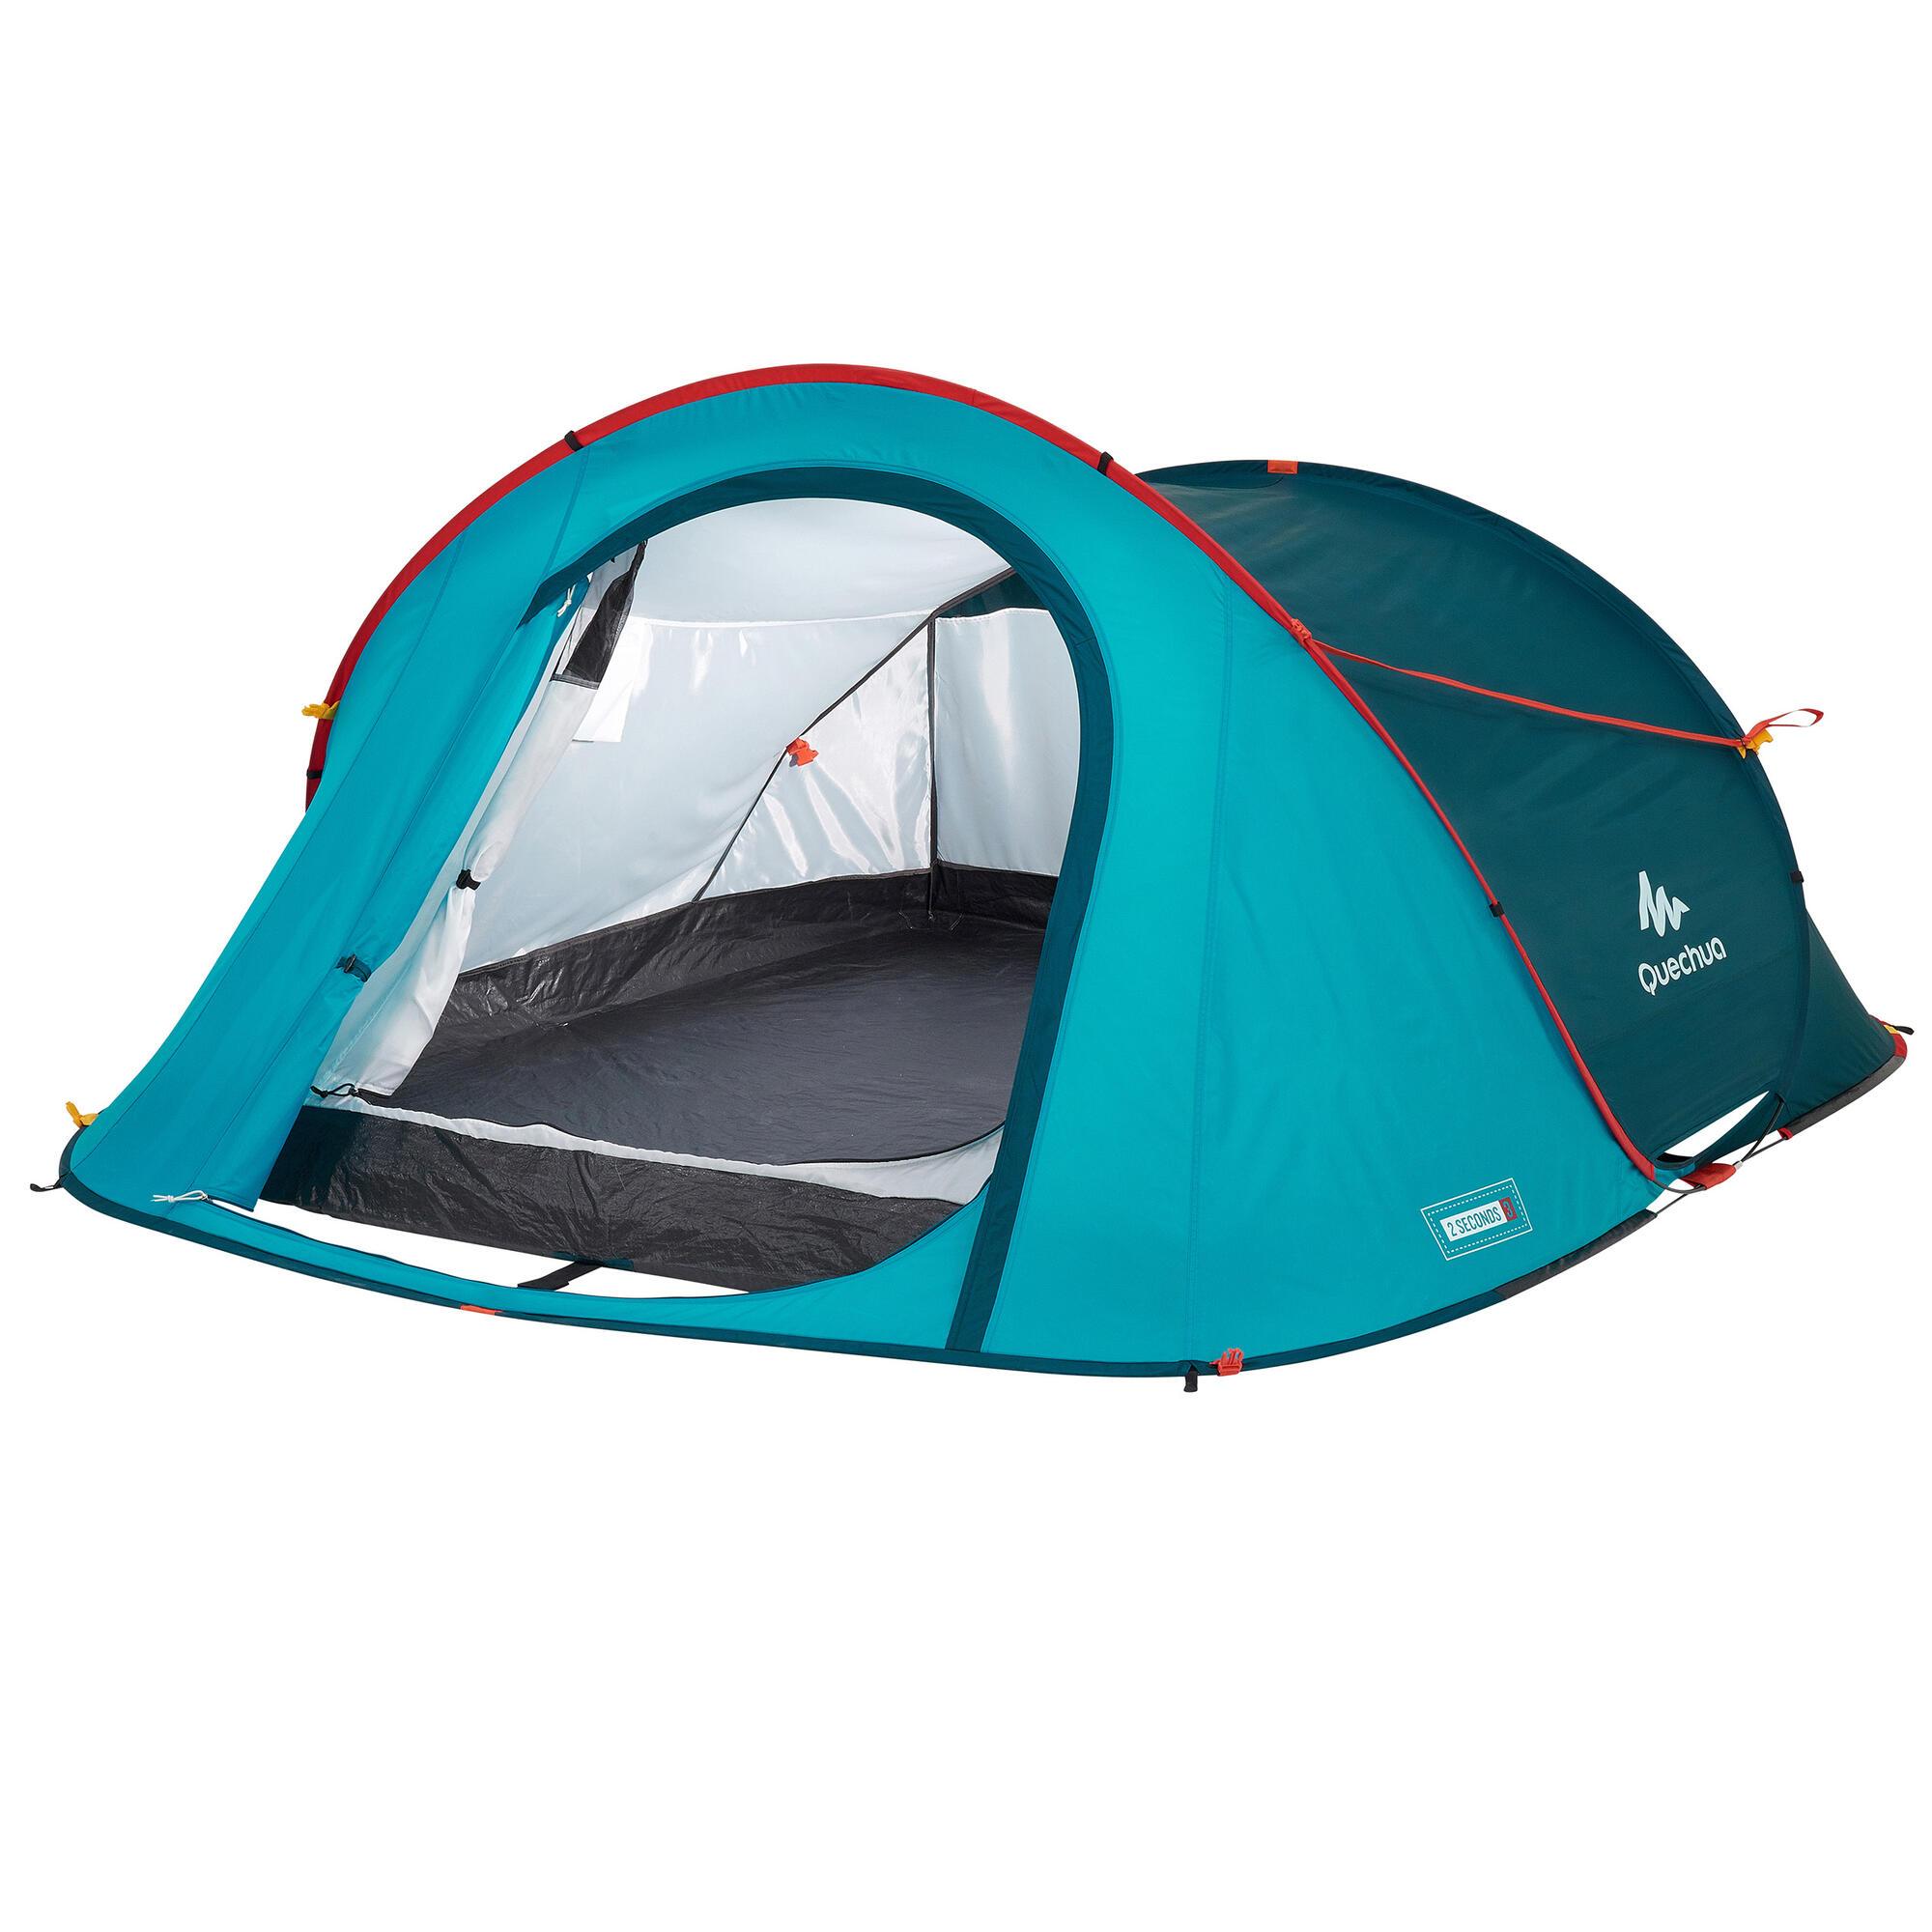 tente de camping 2 seconds 3 personnes bleue quechua. Black Bedroom Furniture Sets. Home Design Ideas